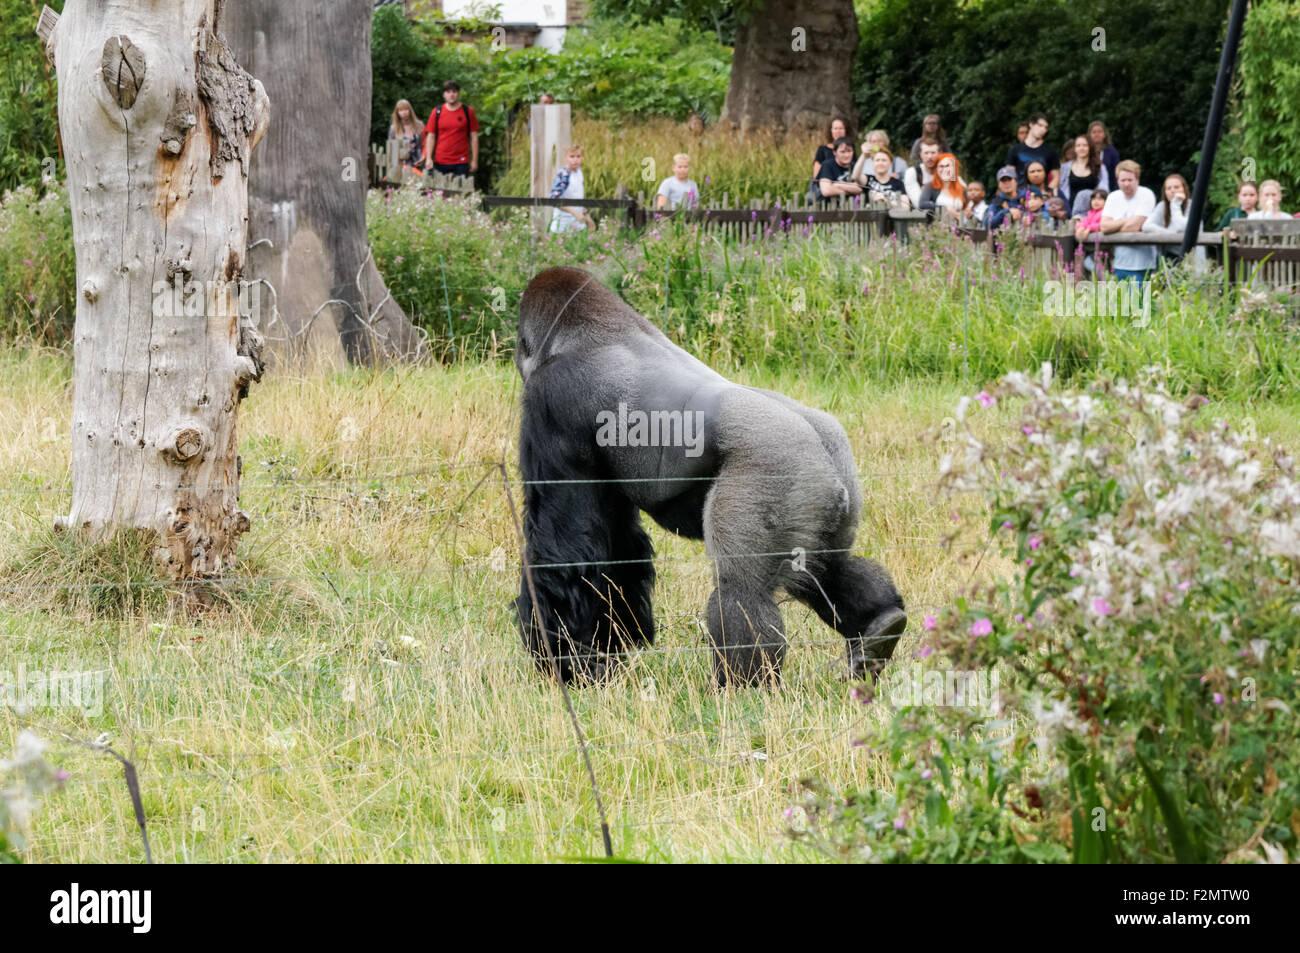 The western lowland gorilla (Gorilla gorilla gorilla) at the ZSL London Zoo, London England United Kingdom UK - Stock Image